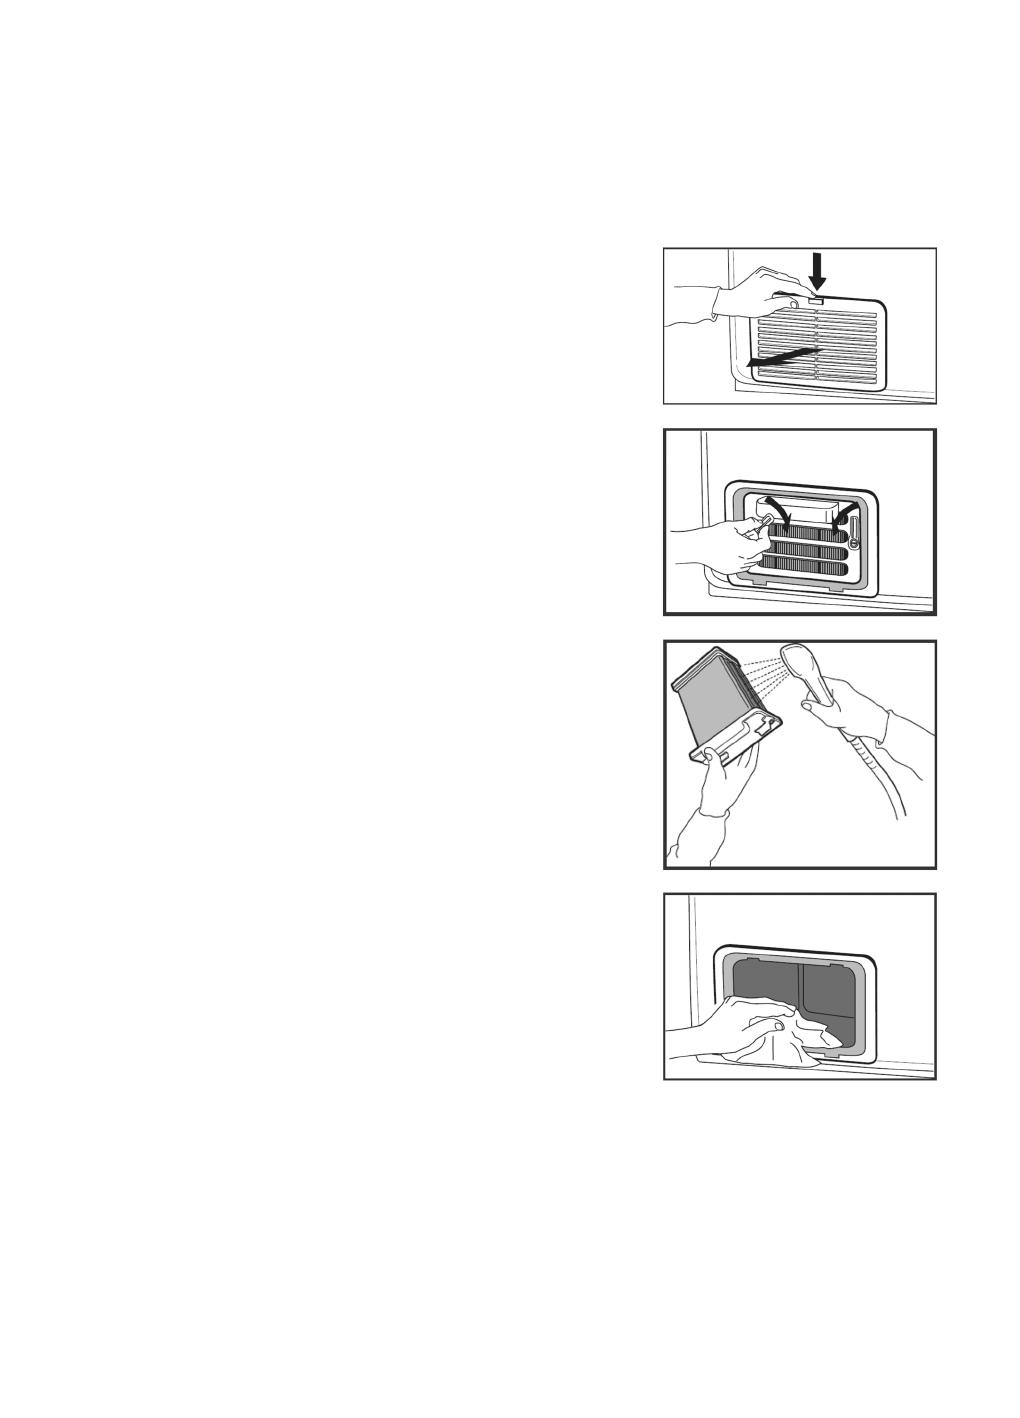 handleiding whirlpool awz 9777 pagina 8 van 12 deutsch. Black Bedroom Furniture Sets. Home Design Ideas